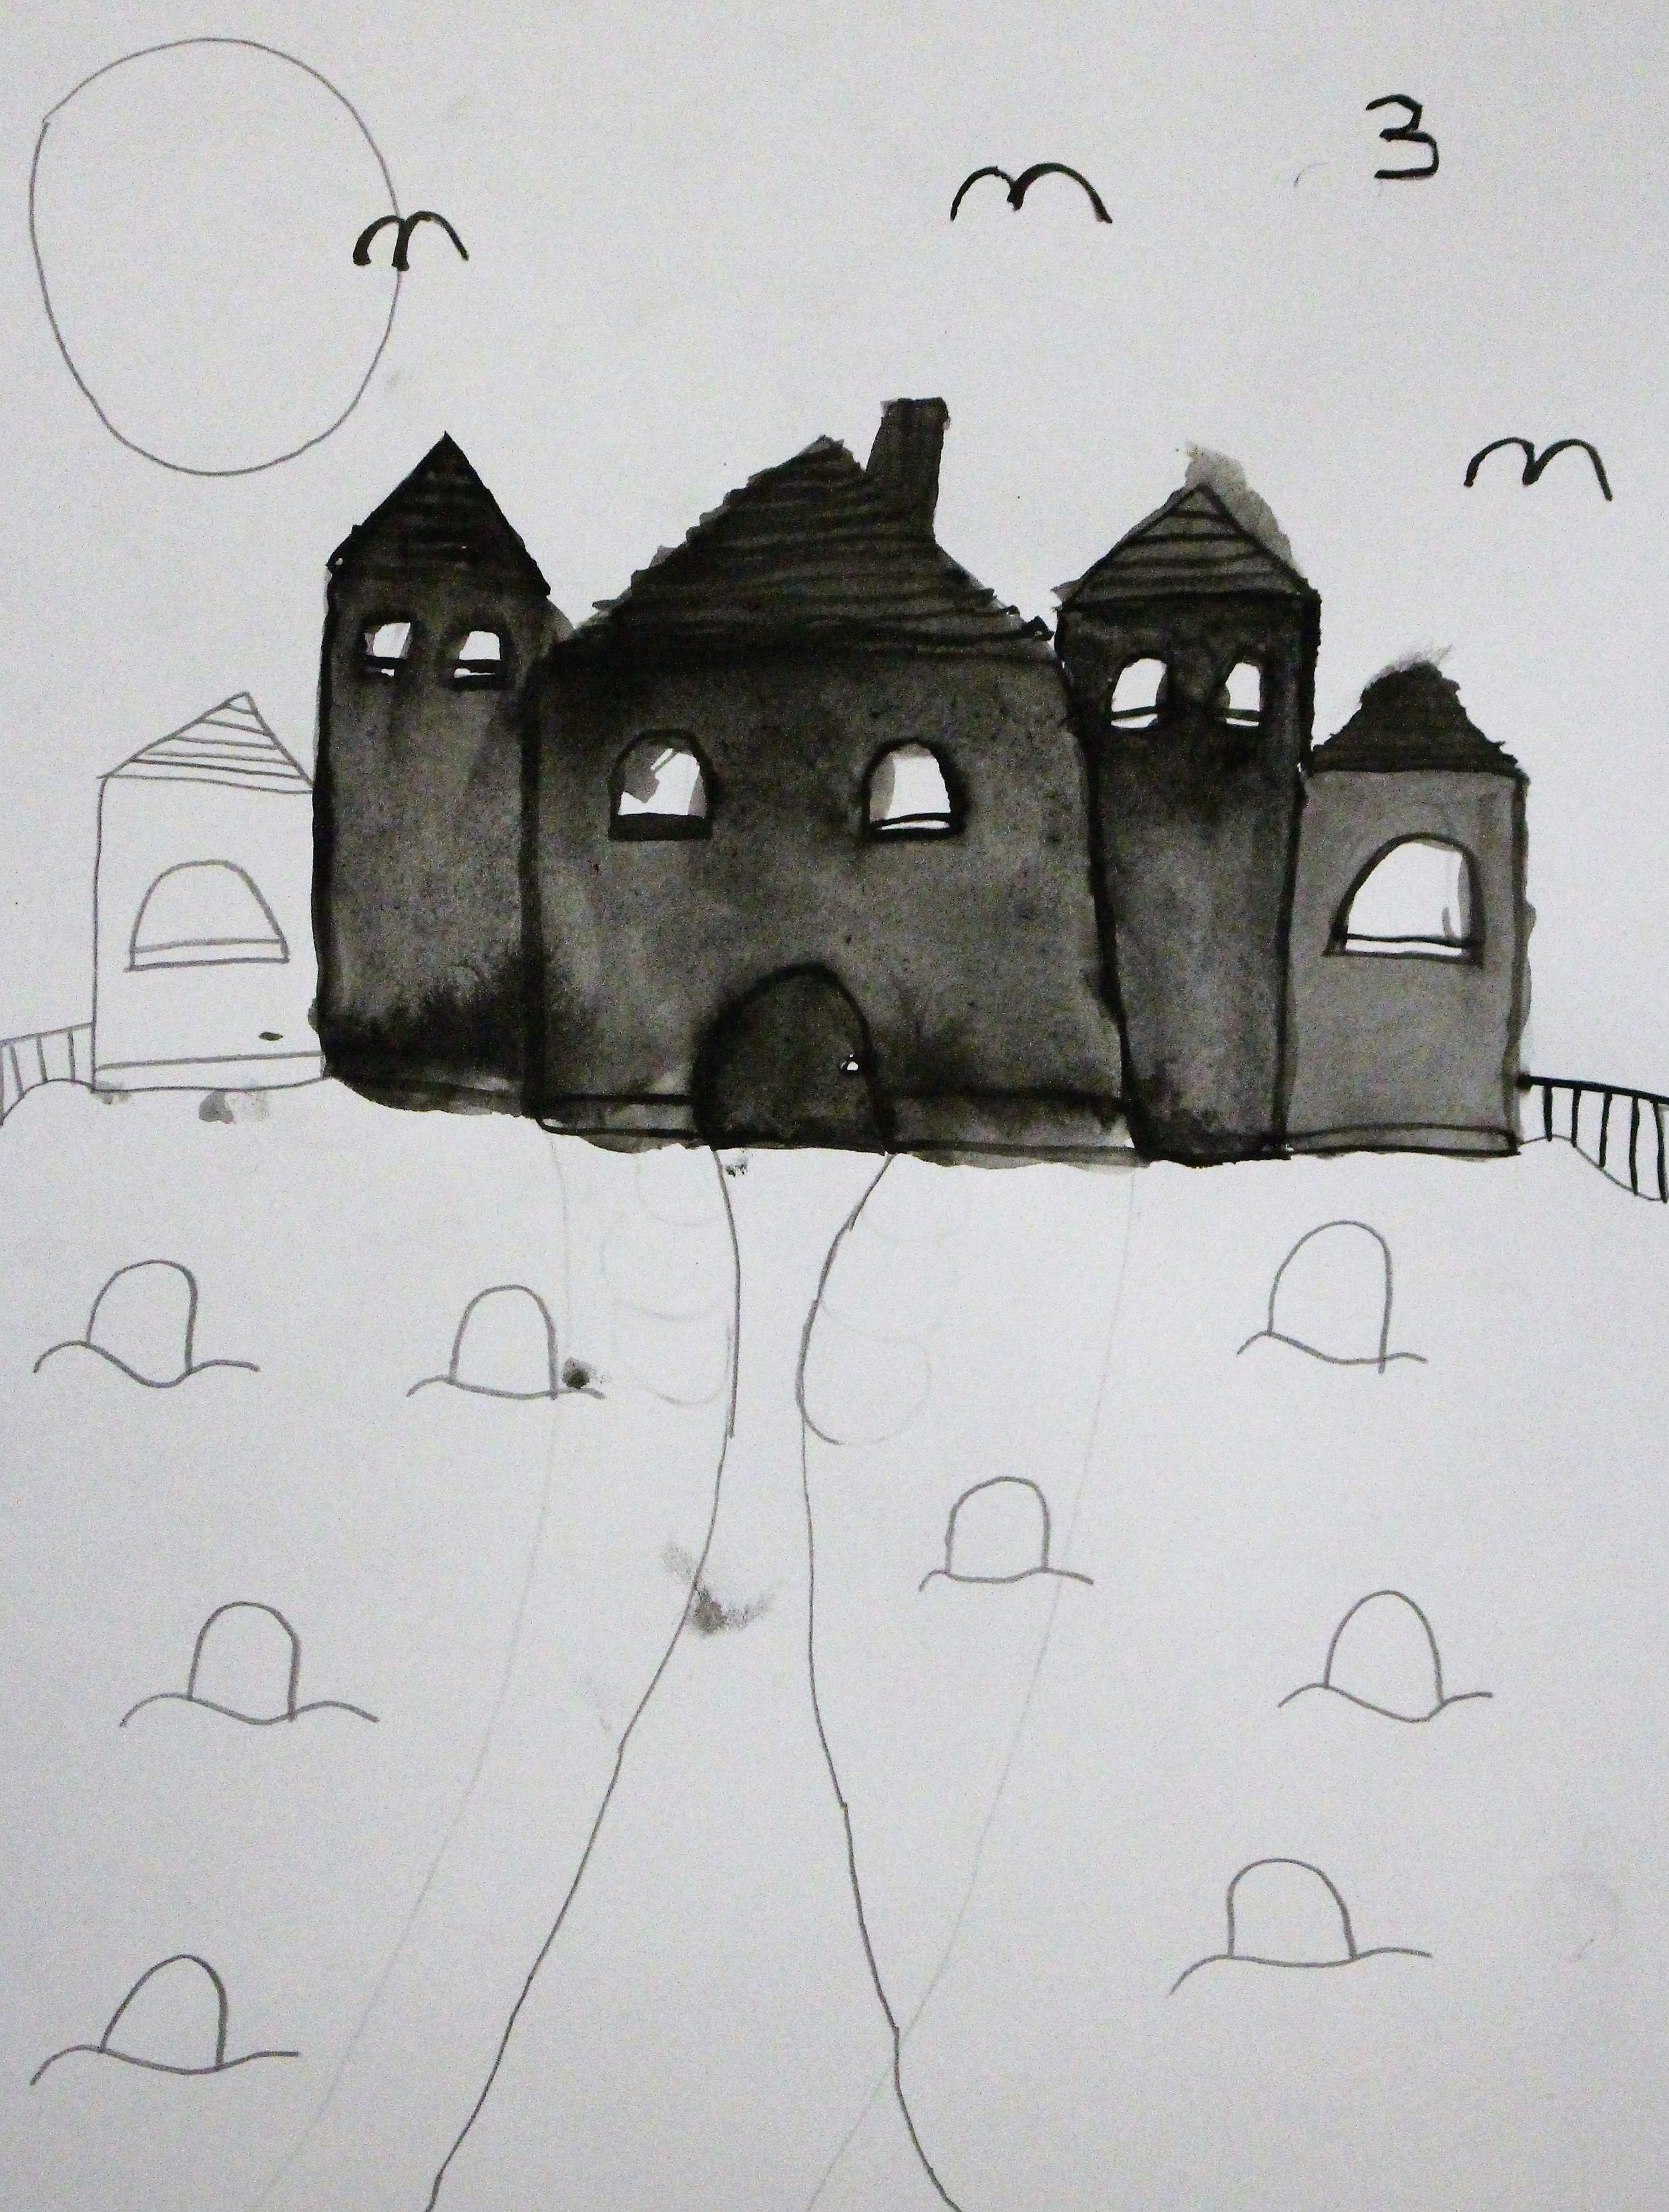 5th Grade: Avalin B. - Artwork: Spooky Victorian Home Silhouette(Work in Progress)